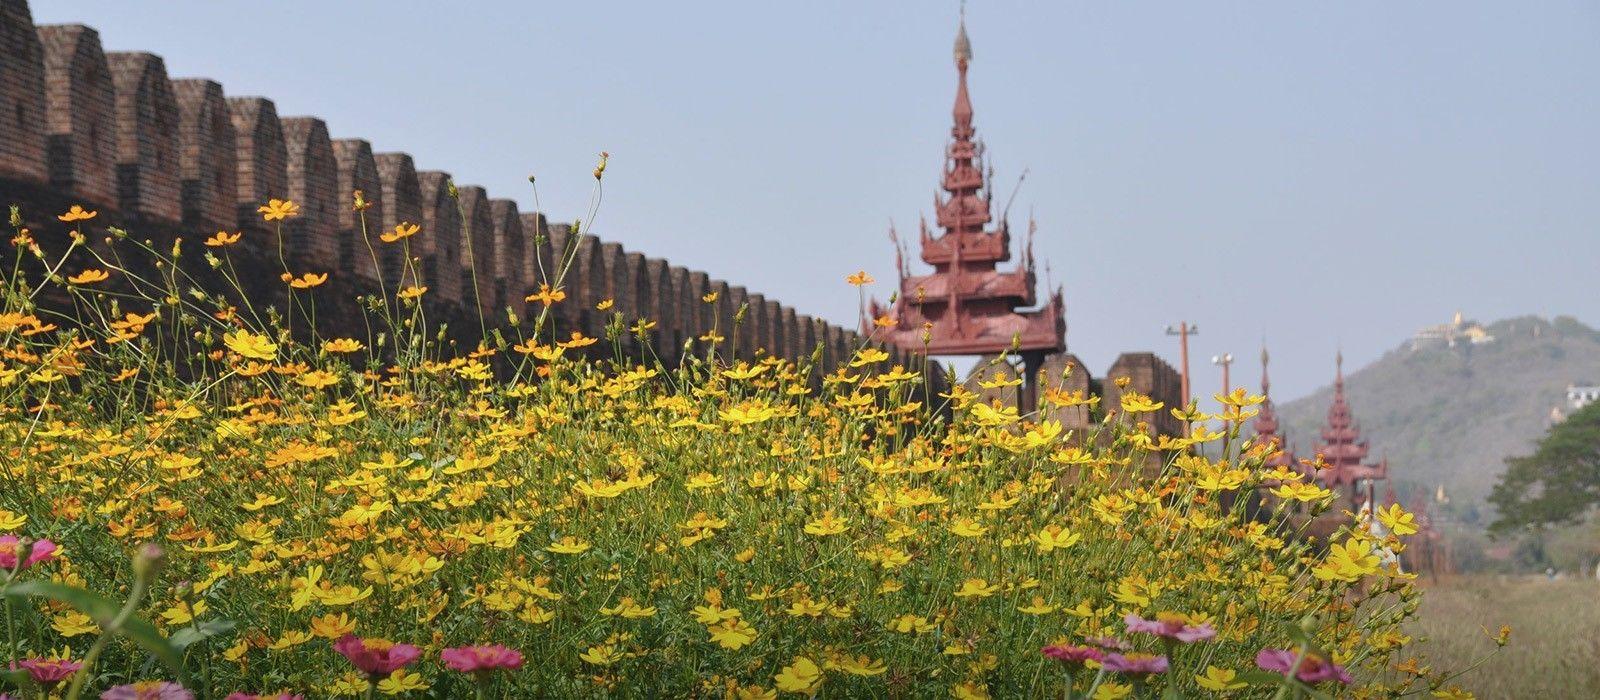 Myanmar: Beaches to Golden Rock Tour Trip 5